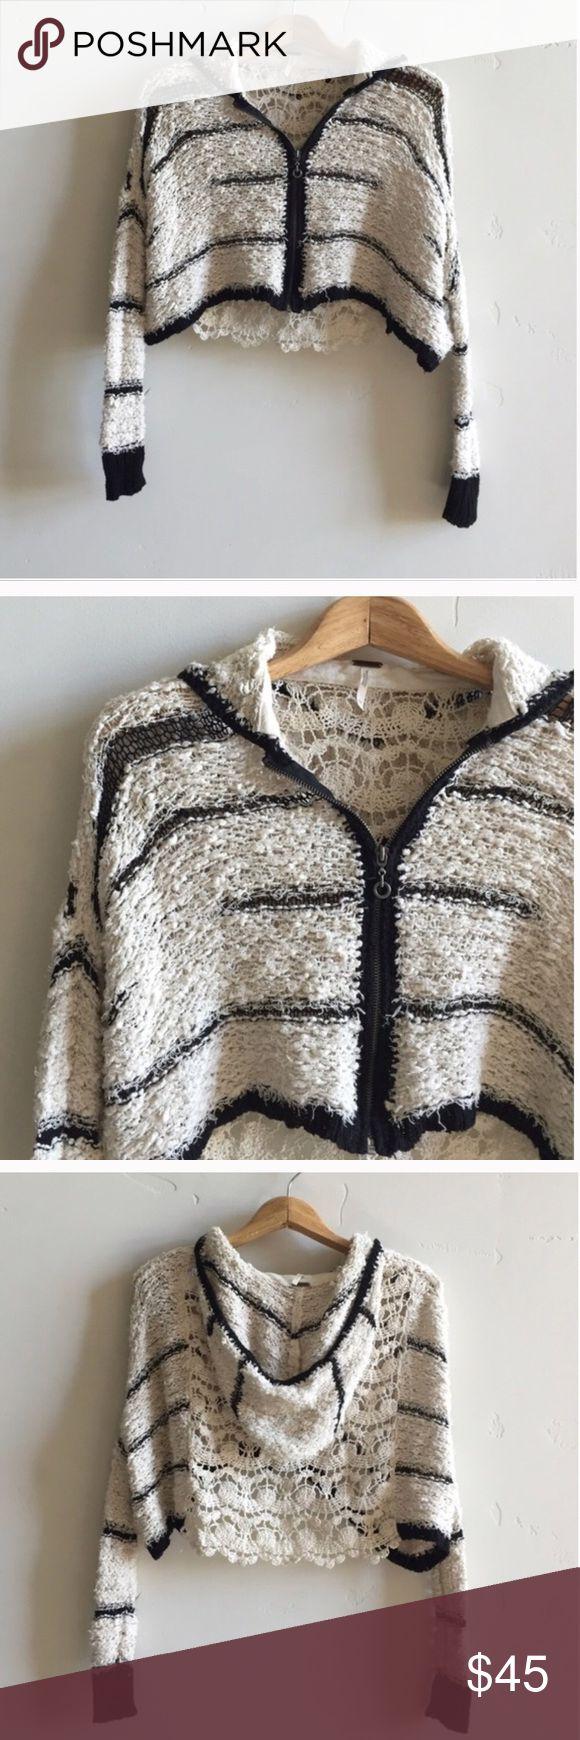 Free People black & white striped zip up sweater Black and white striped free People hooded zip up sweater Free People Sweaters